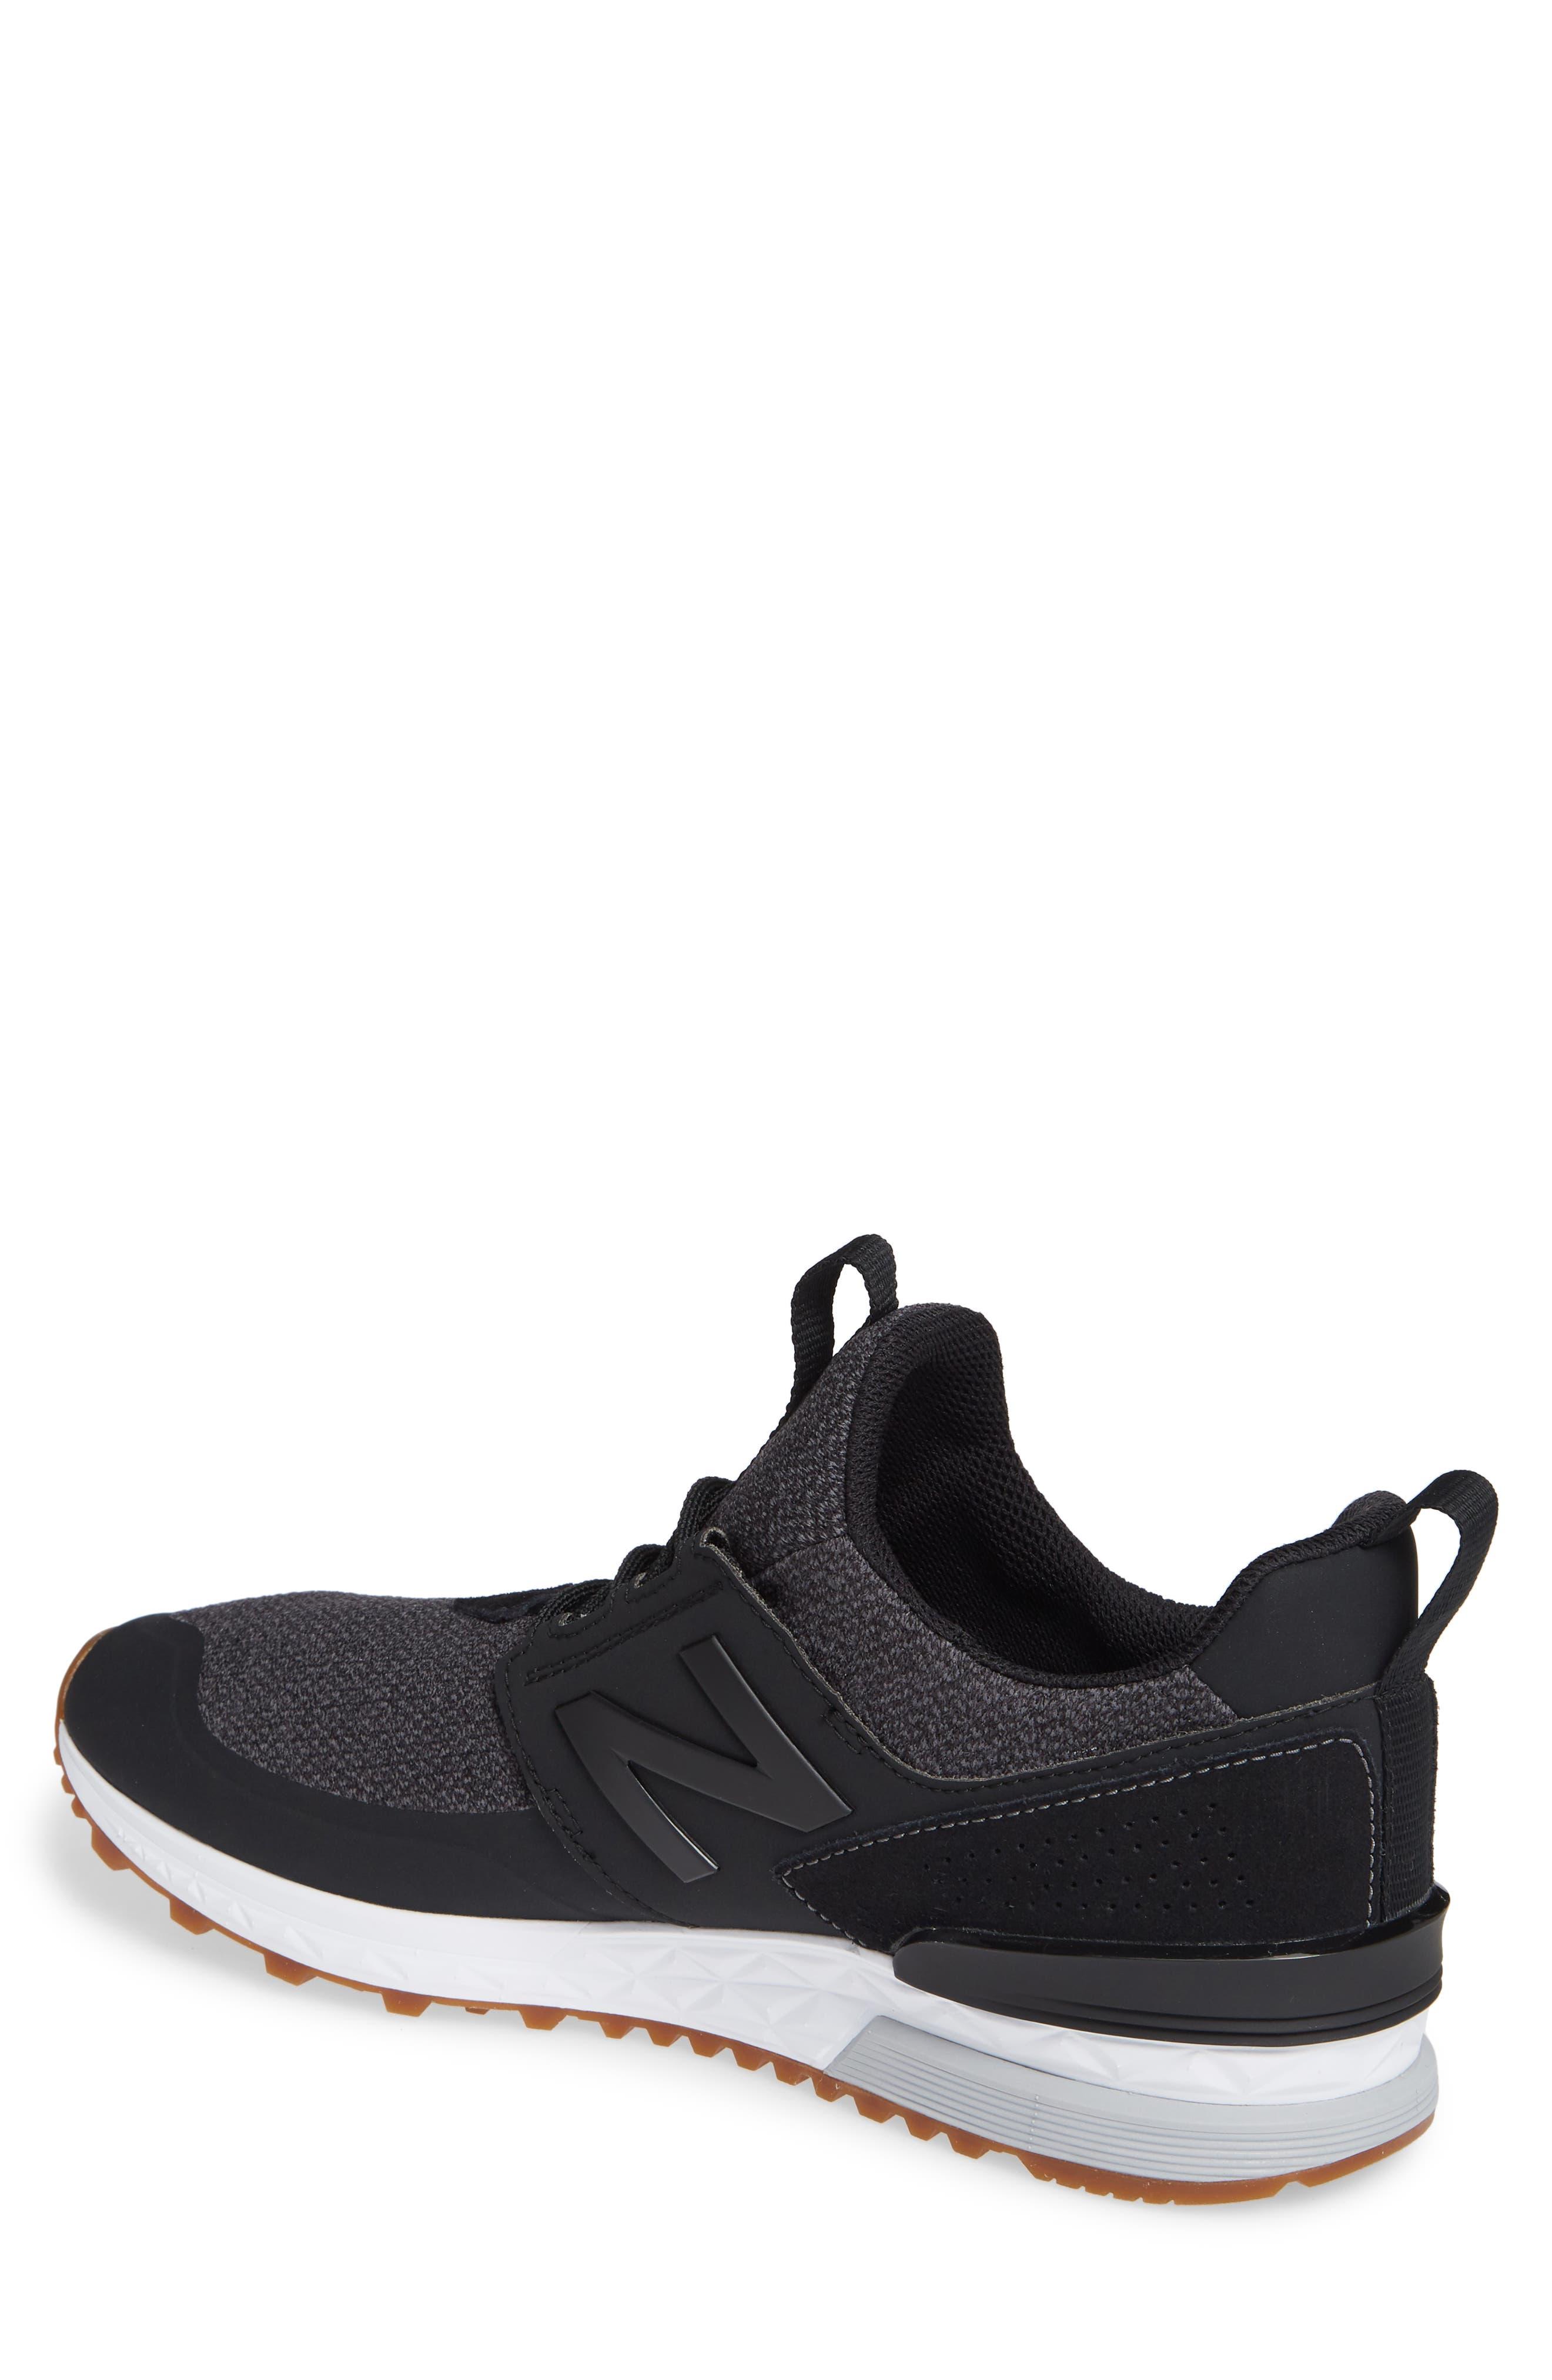 574 Sport Sneaker,                             Alternate thumbnail 2, color,                             BLACK SYNTHETIC/ TEXTILE